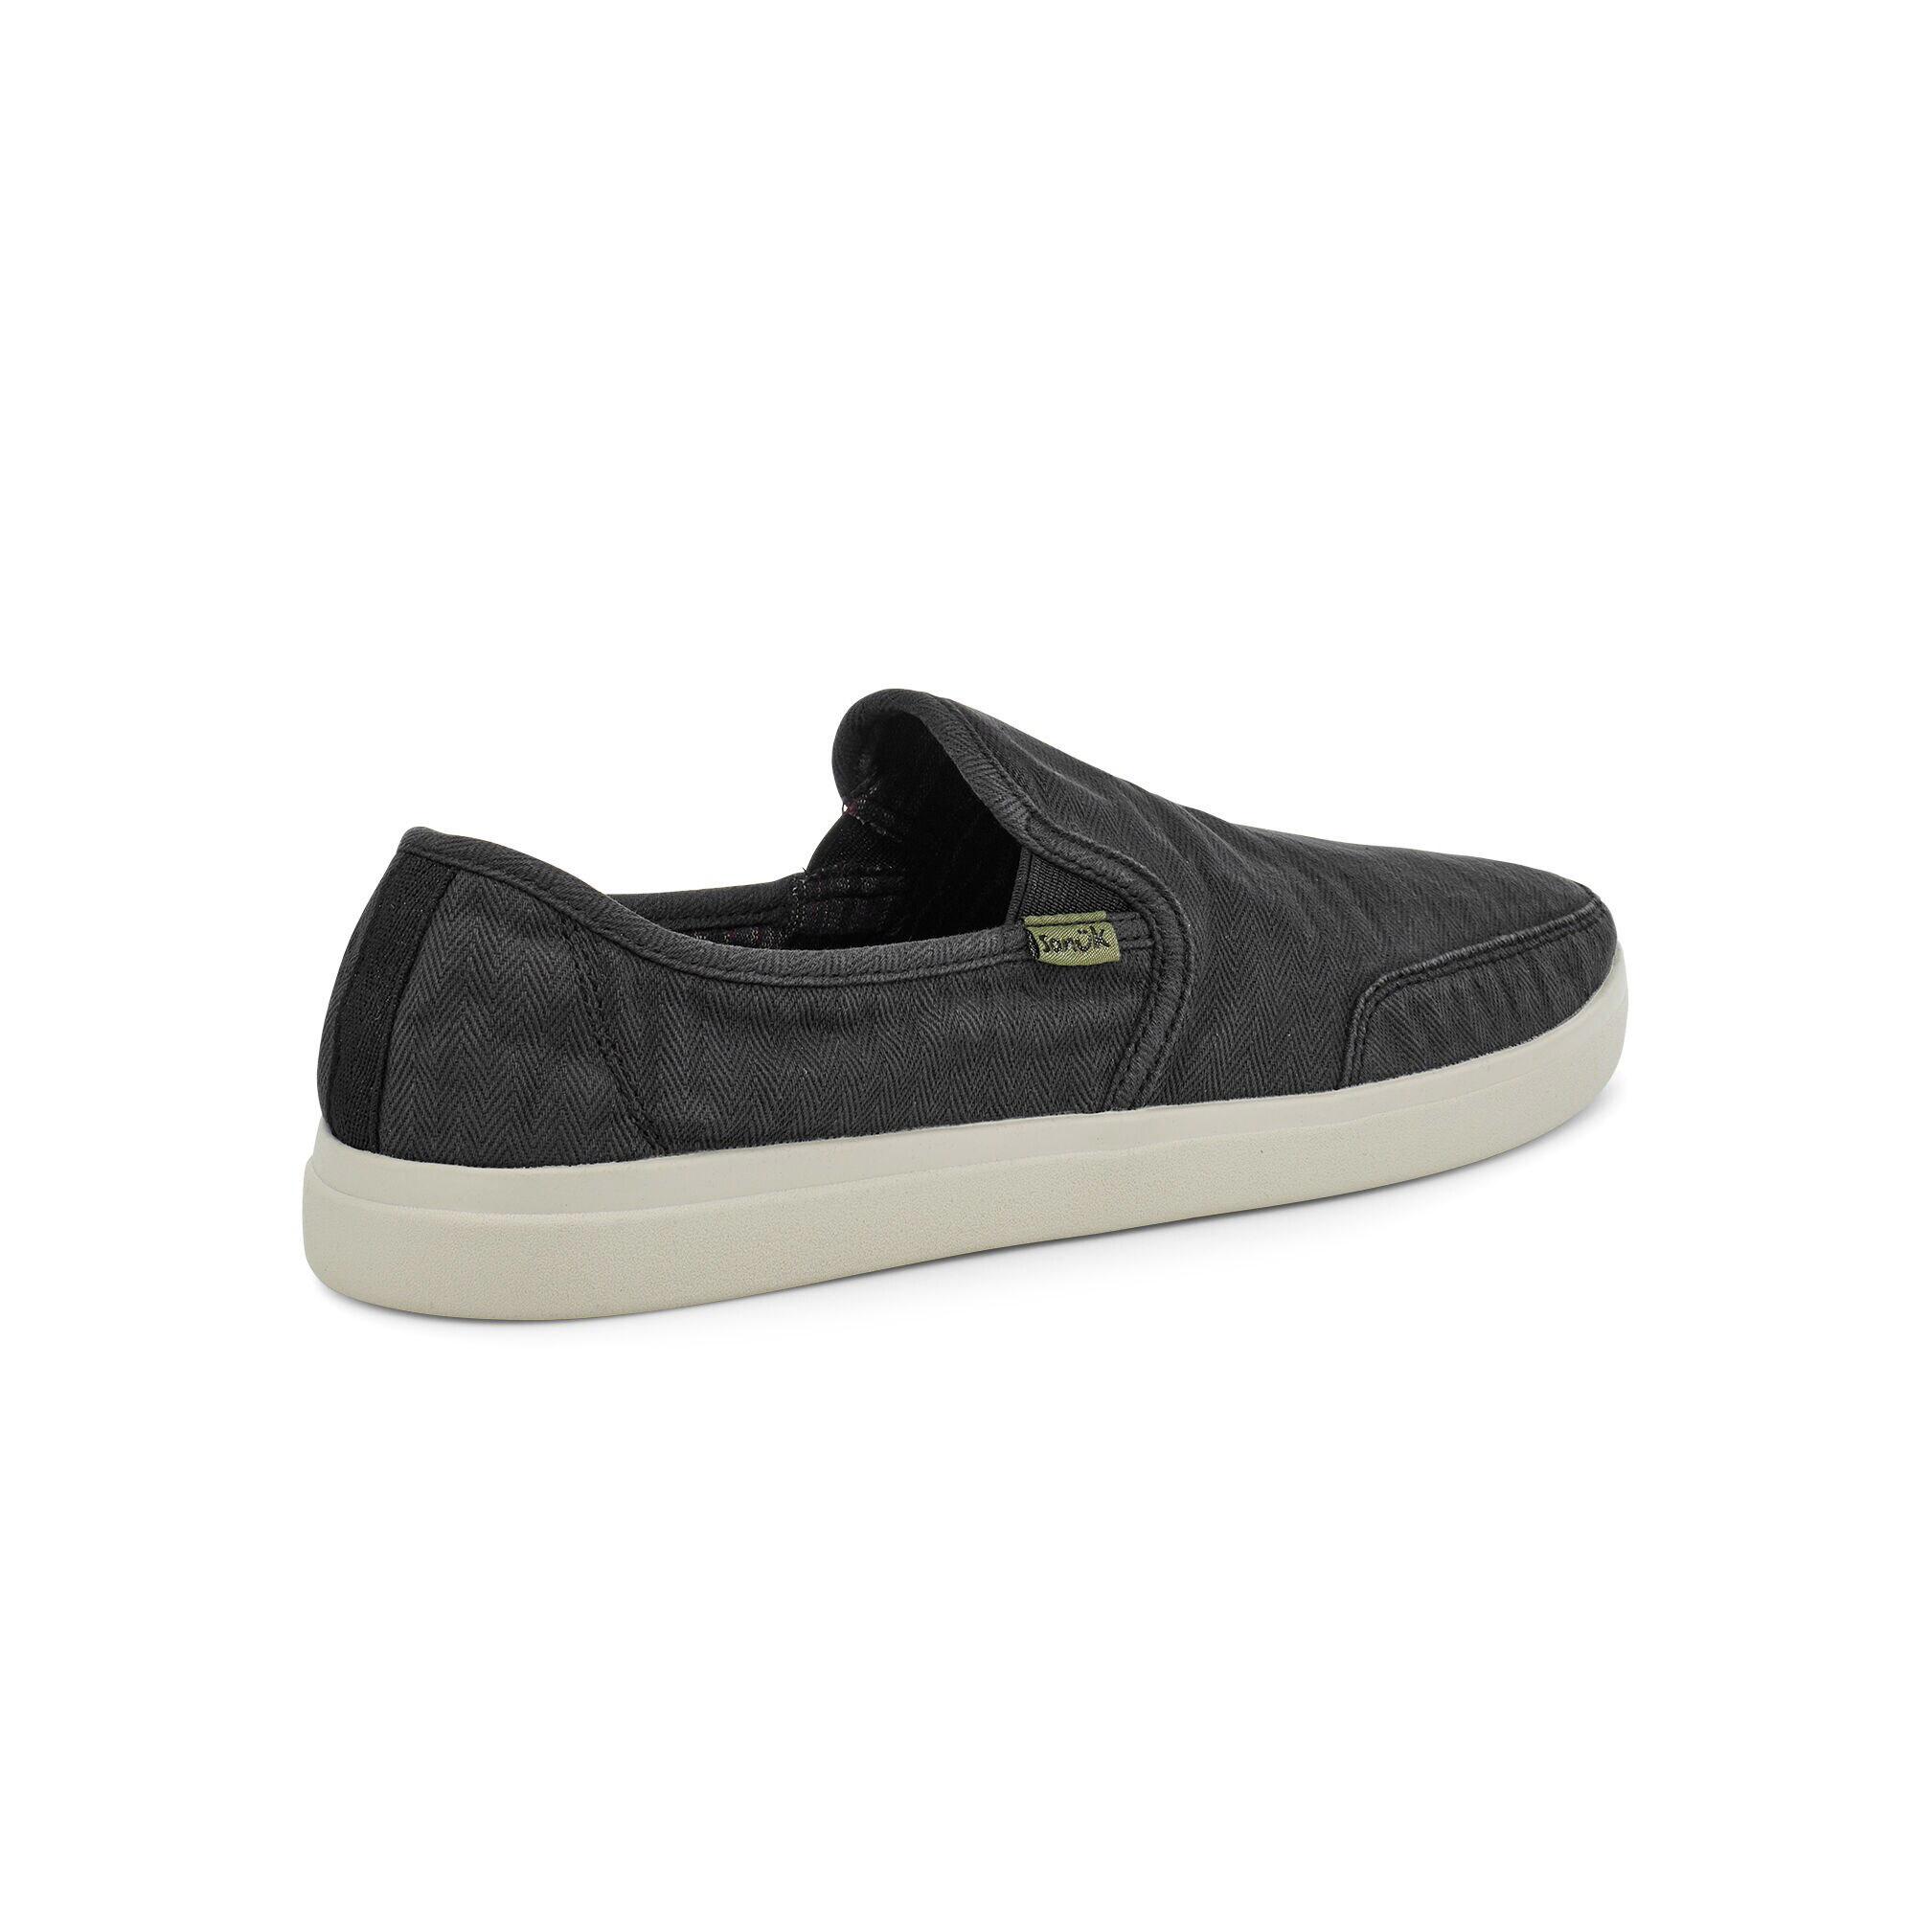 Sanuk Sanuk Vagabond Slip-On Sneaker Wash- Black